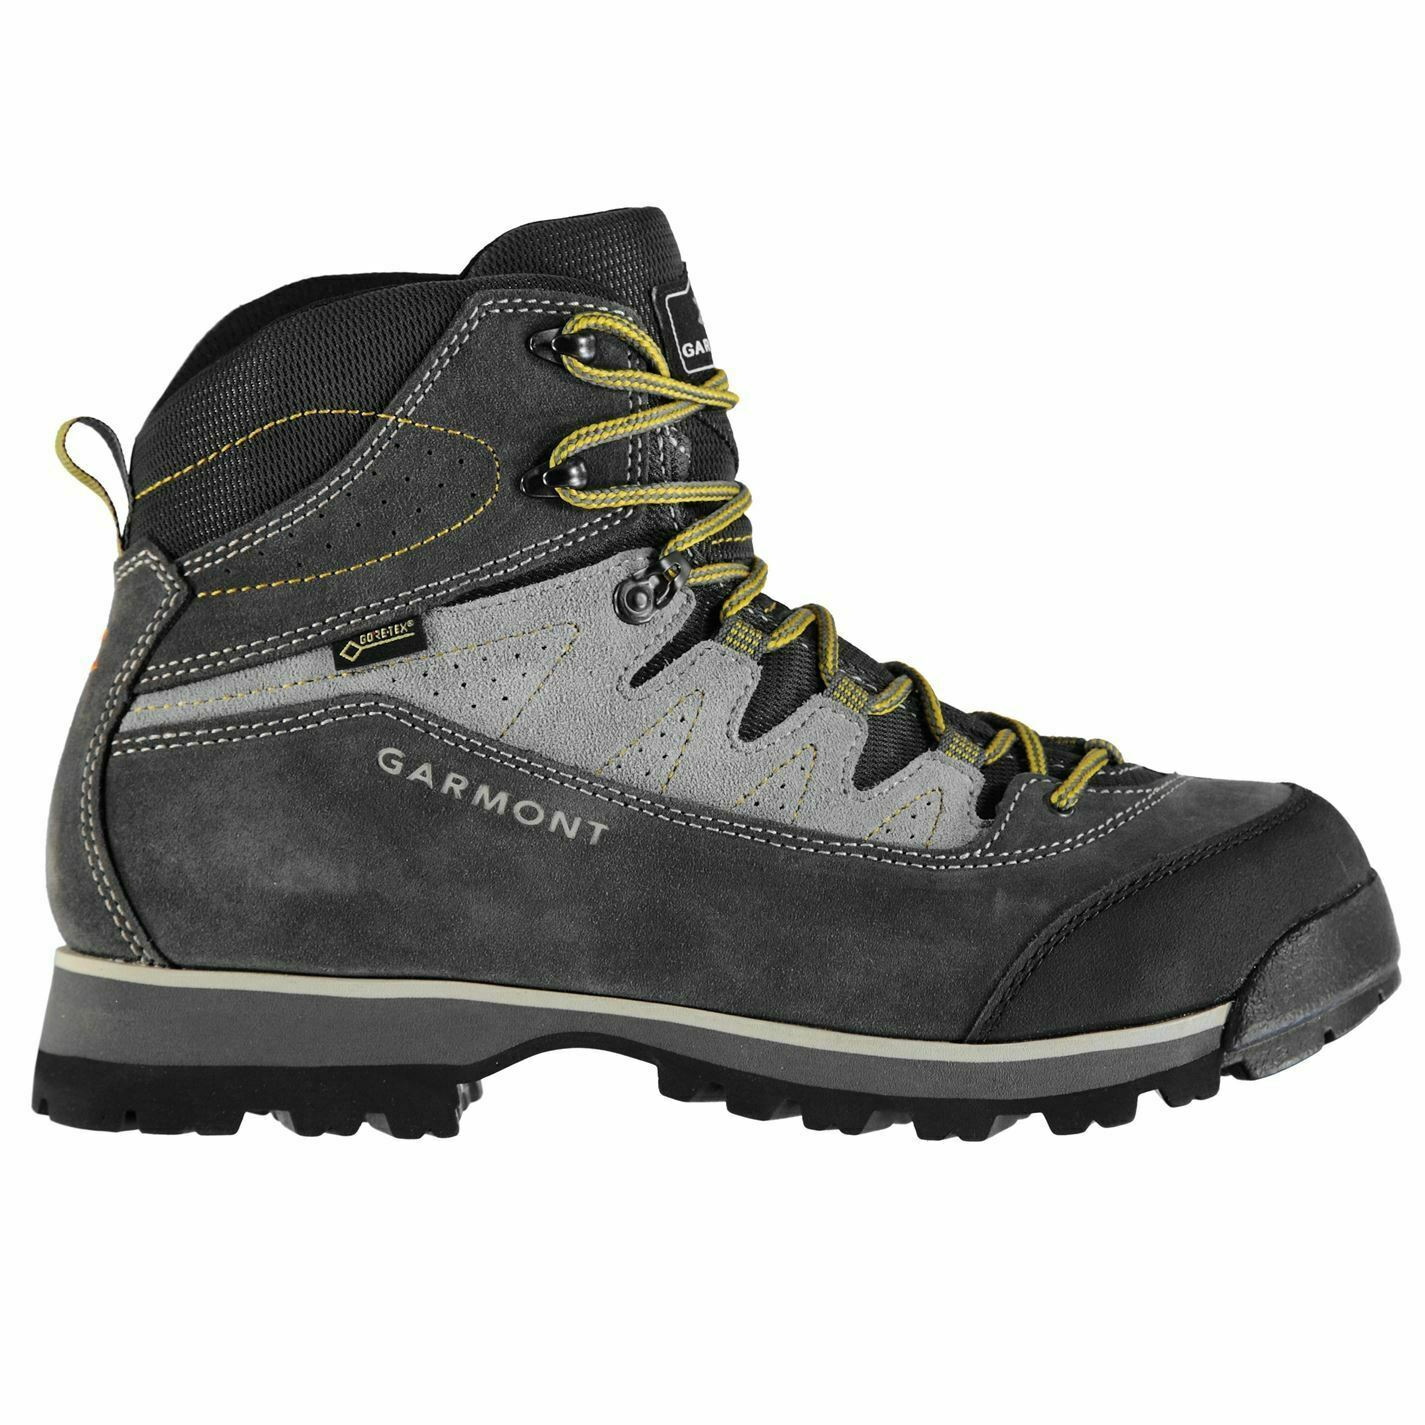 Garmont Lagorai Gore-Tex Waterproof Walking Boots Mens Grey Hiking shoes